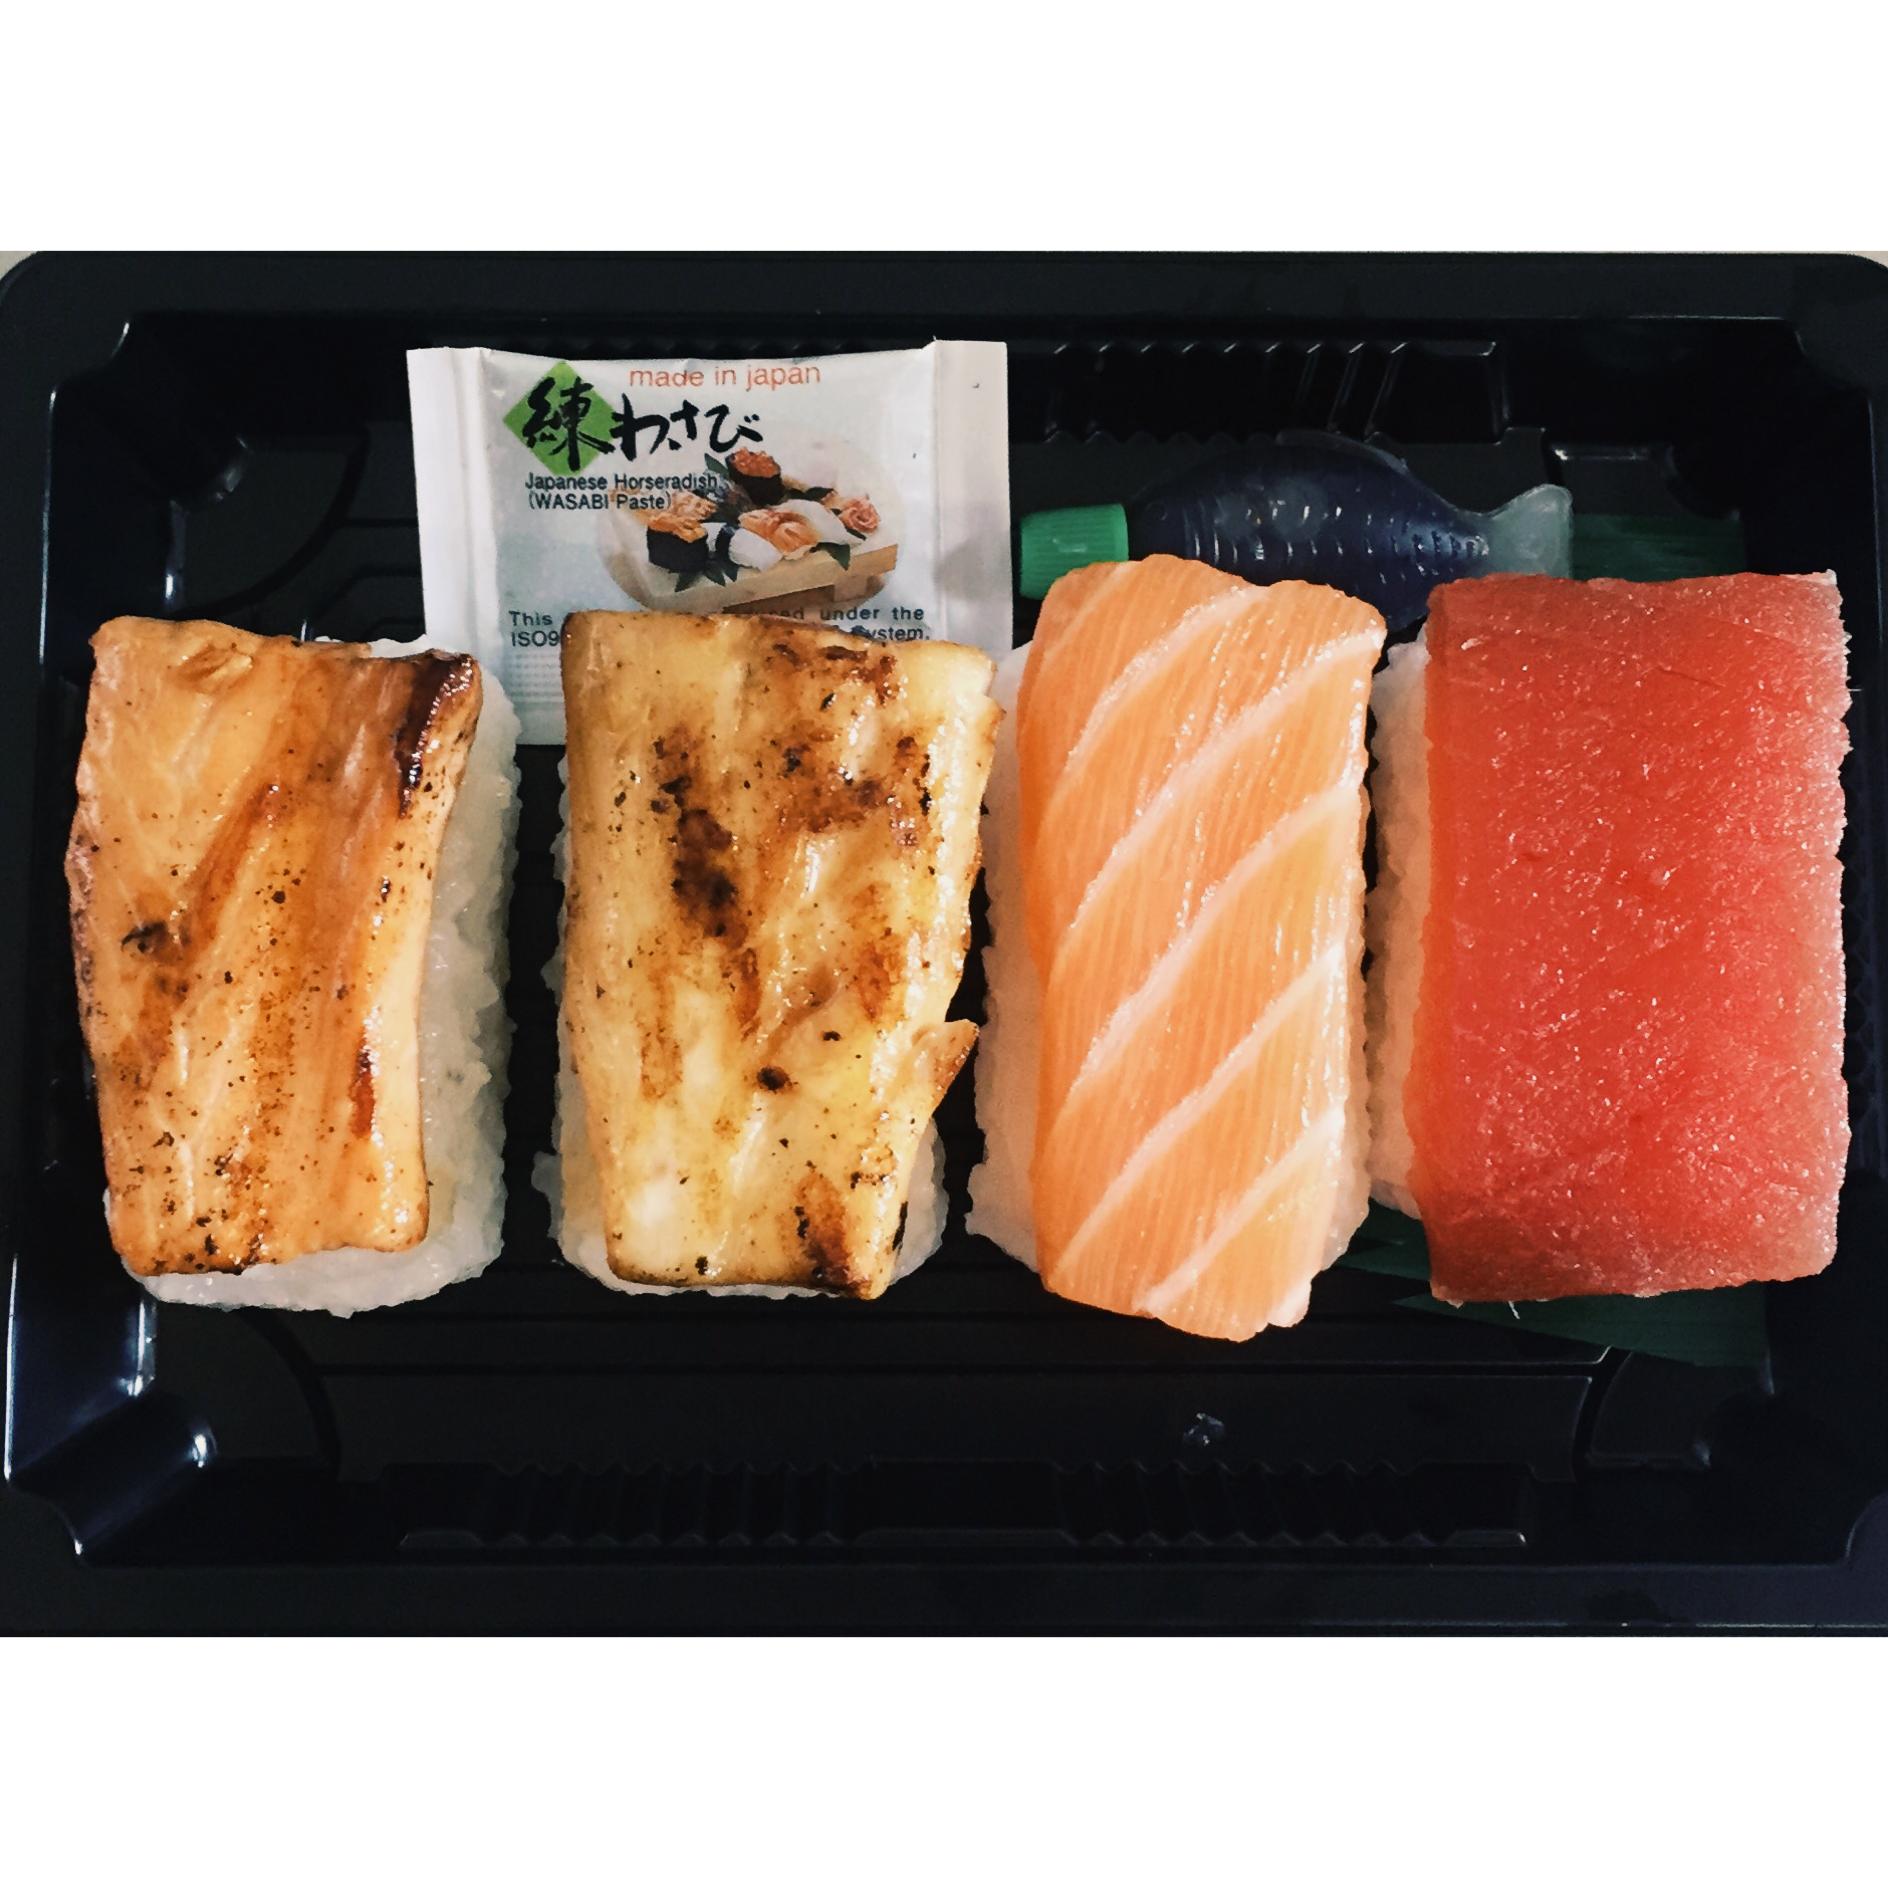 THE MIXED NIGIRI BOX - £4.50  1 x grilled teriyaki salmon nigiri, 1 x grilled teriyaki sea bass nigiri, 1 x salmon nigiri, 1 x tuna nigiri